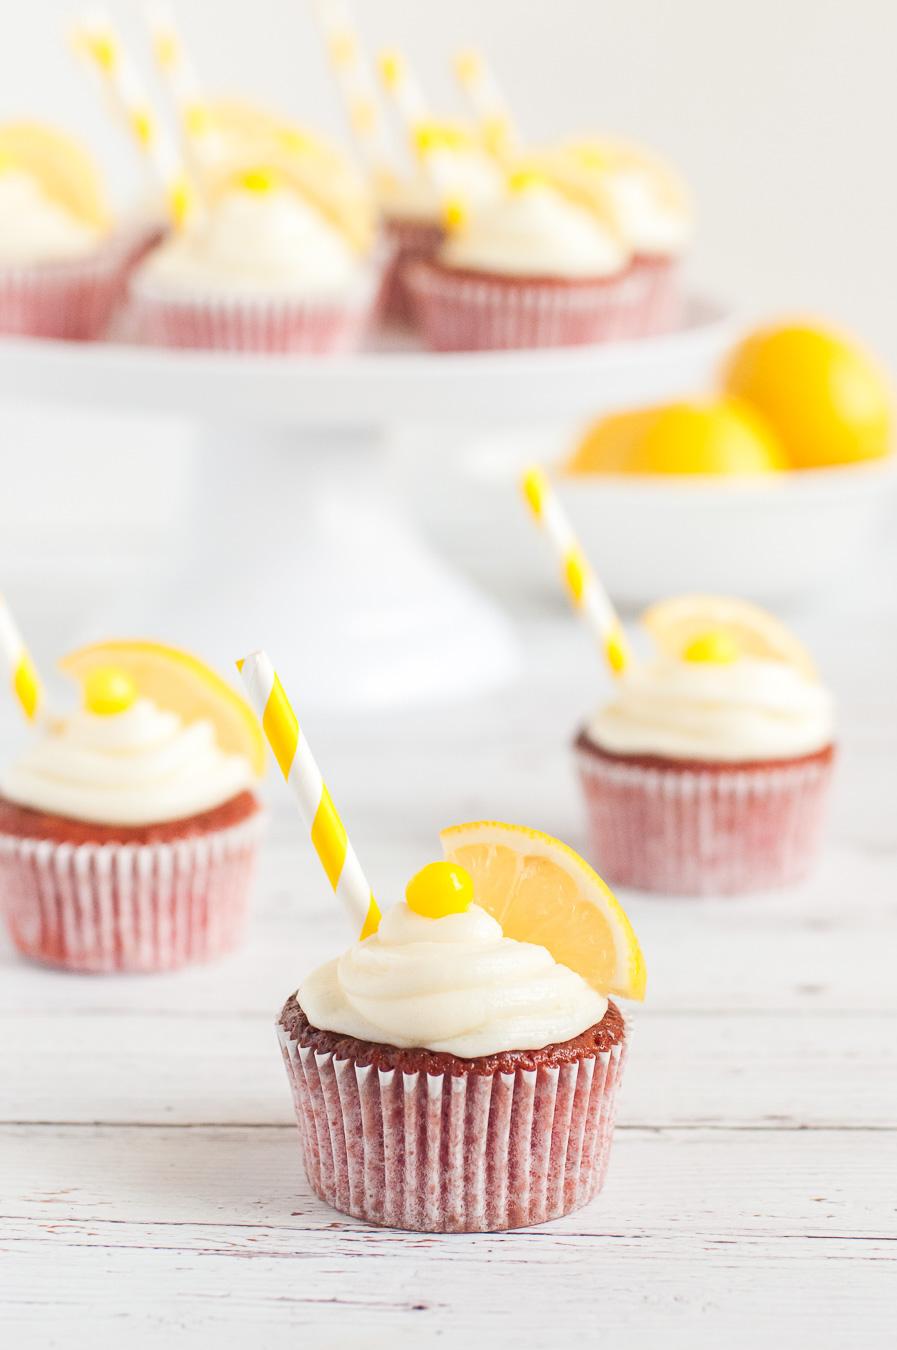 lemonade cupcakes on display with cake stand